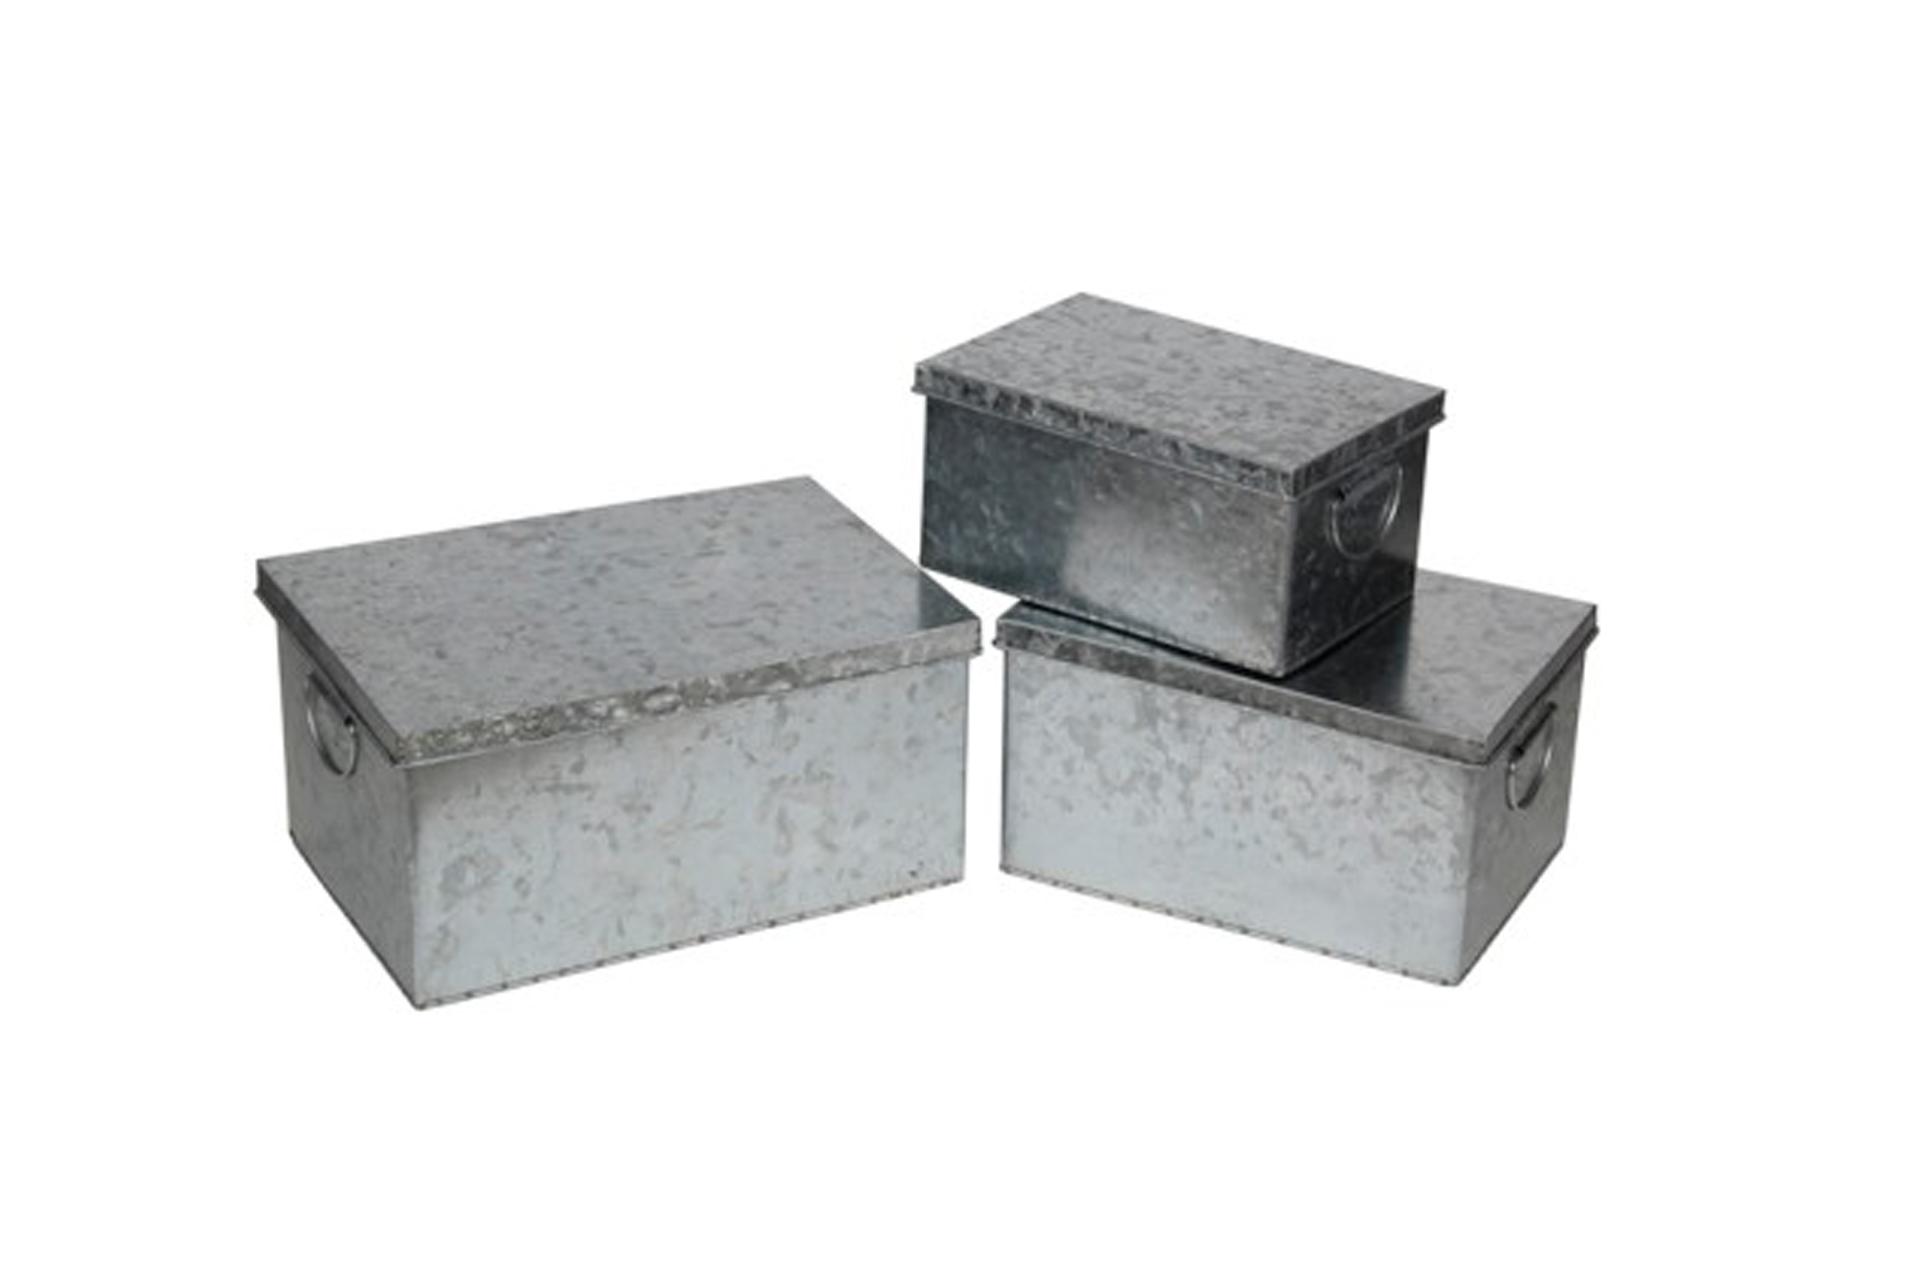 Lovely 3 Piece Set Galvanized Storage Boxes   360